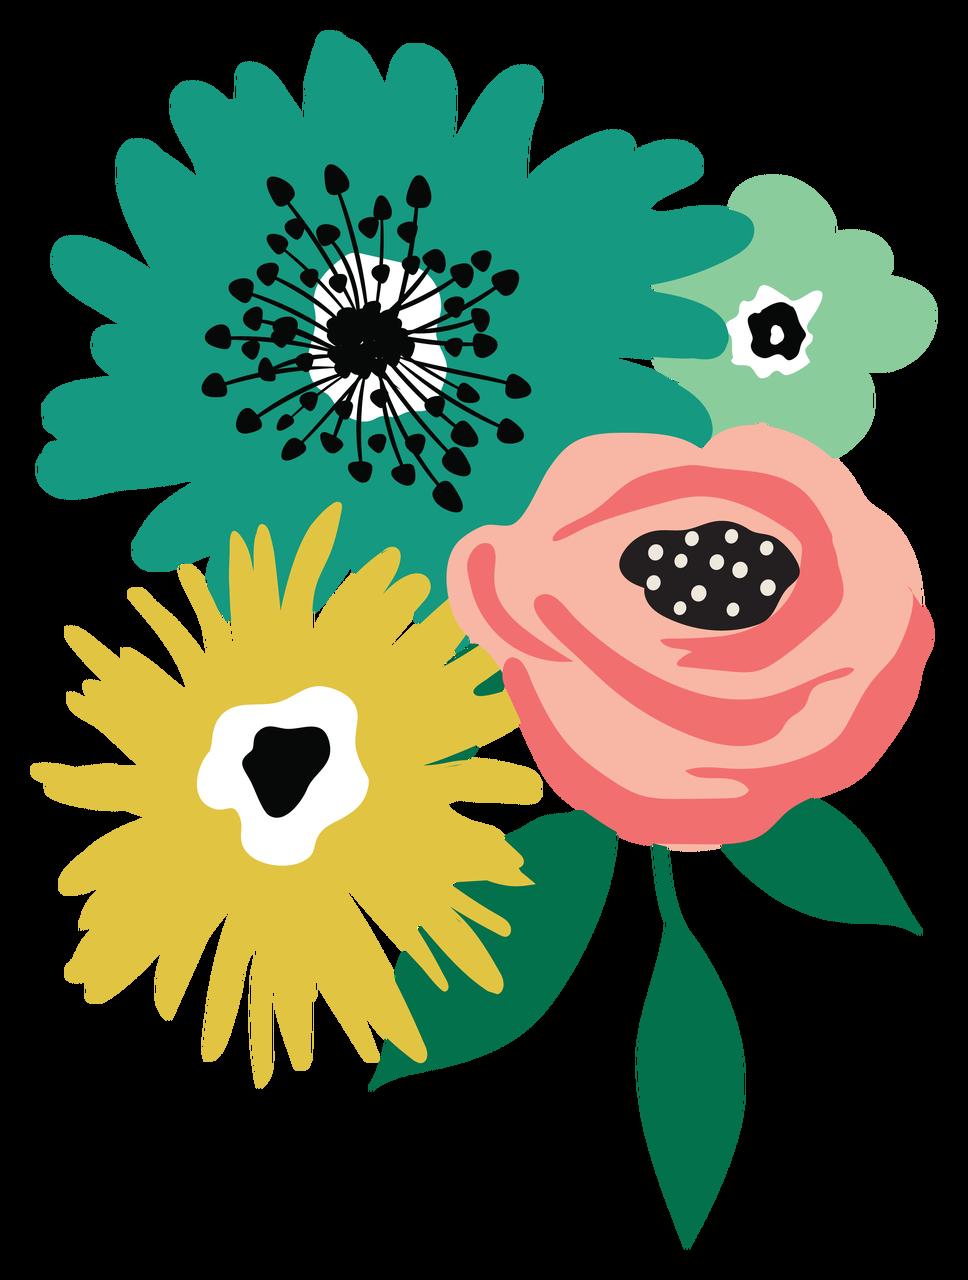 Flower Bundle #2 Print & Cut File